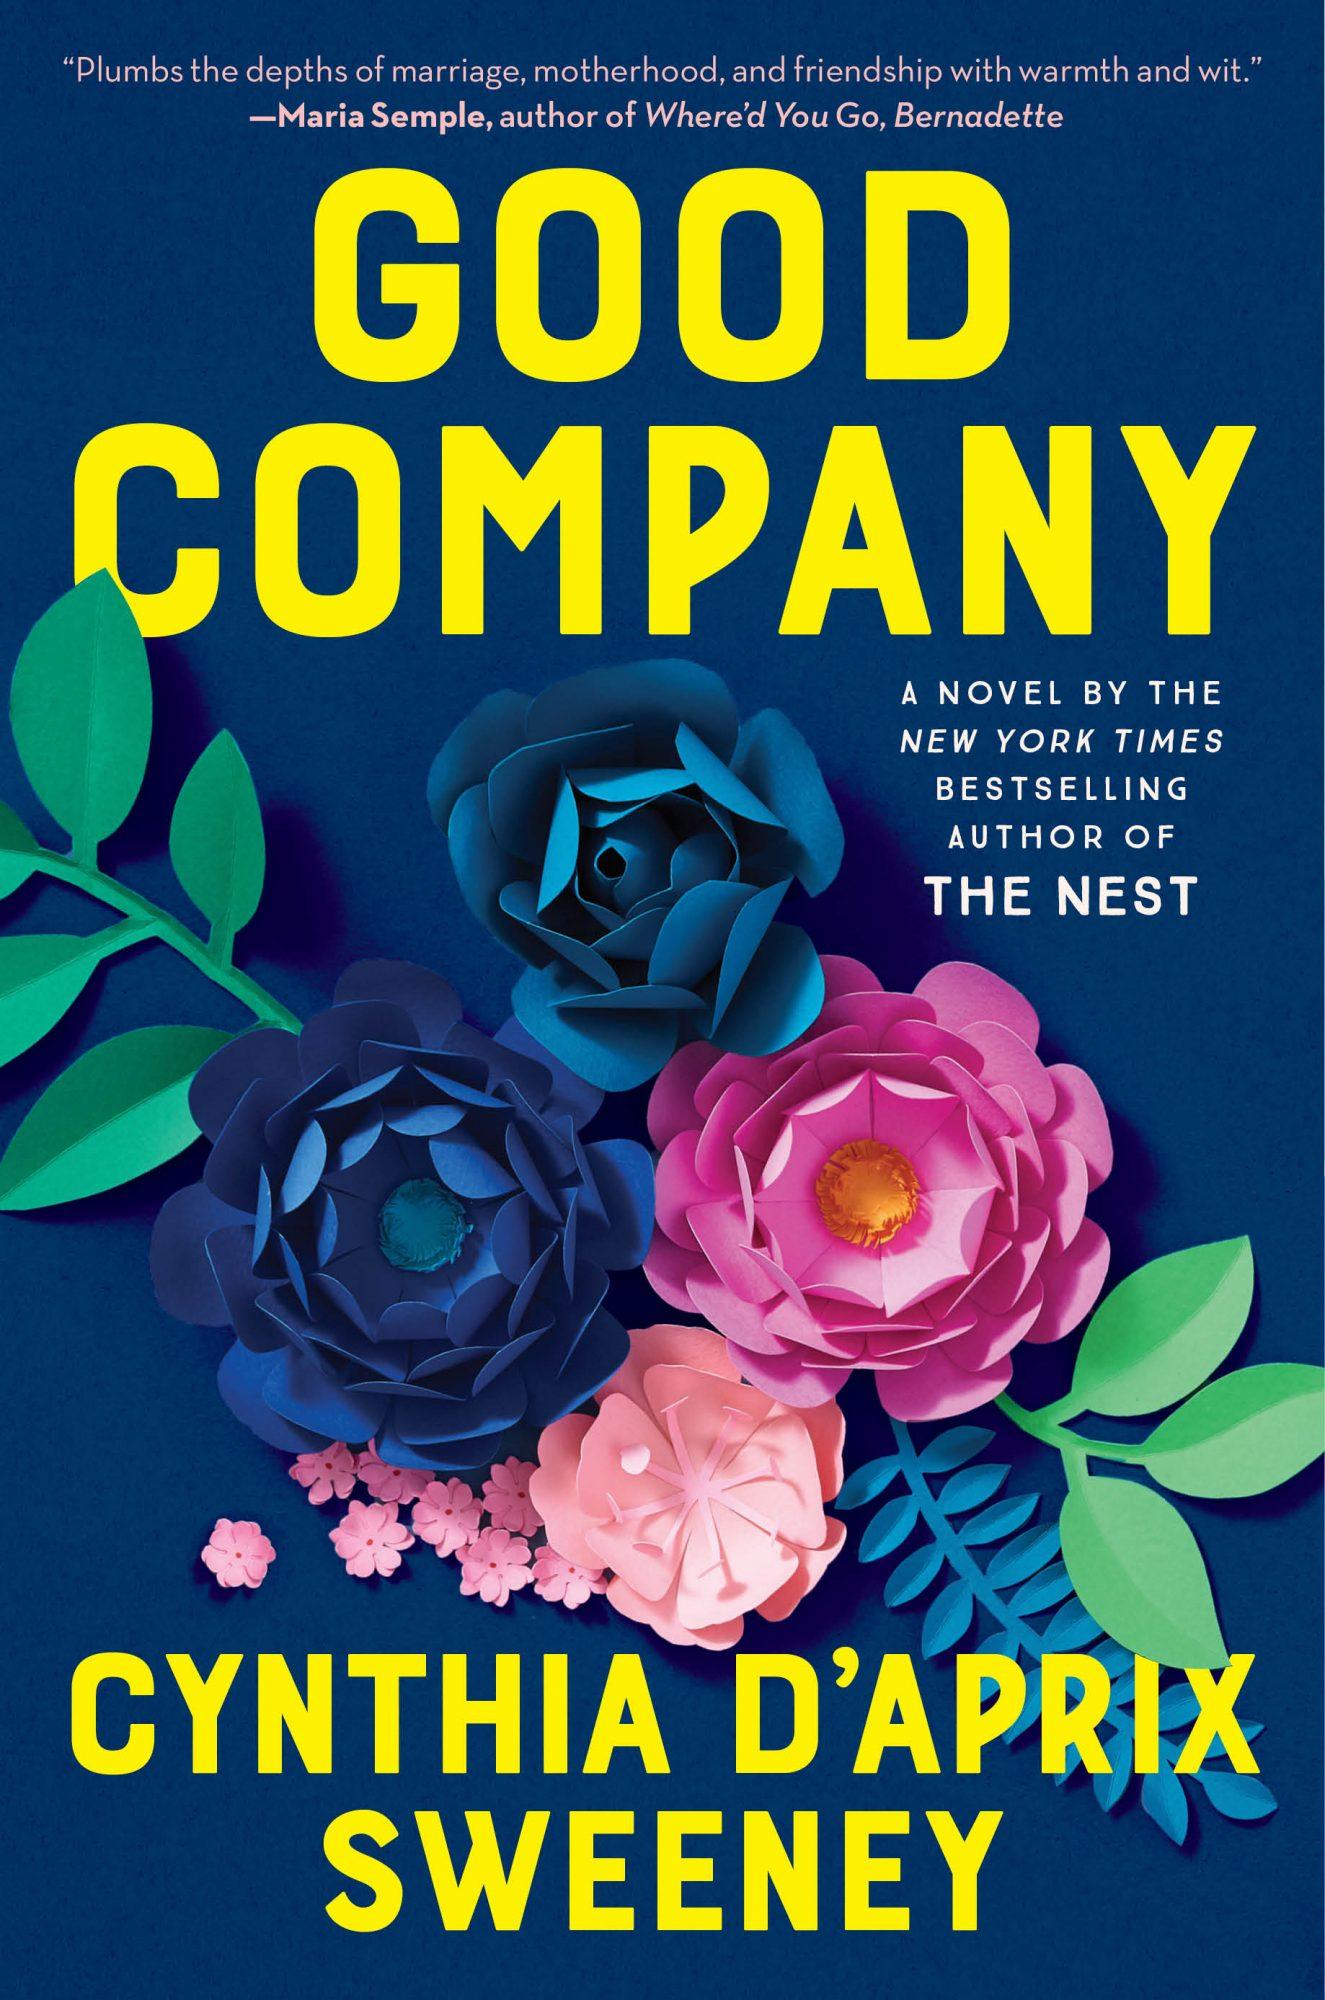 Good Company, by Cynthia D'Aprix Sweeney